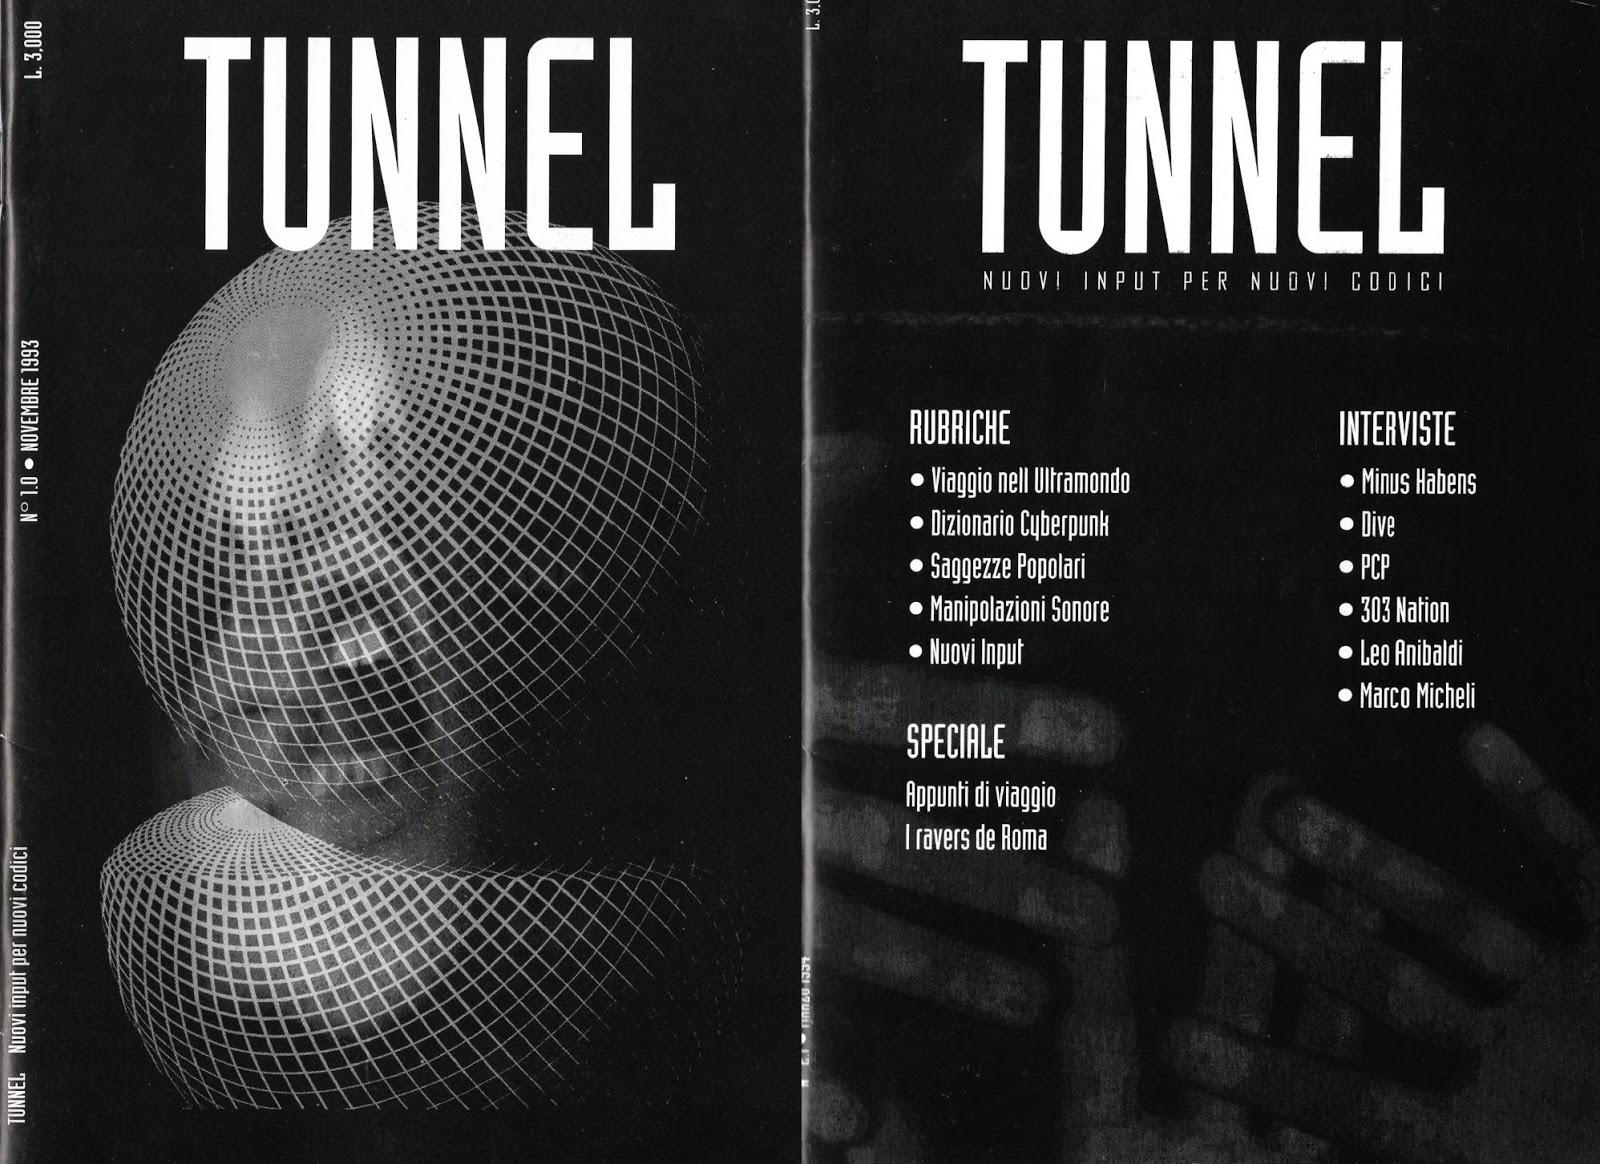 tunnel-1-2